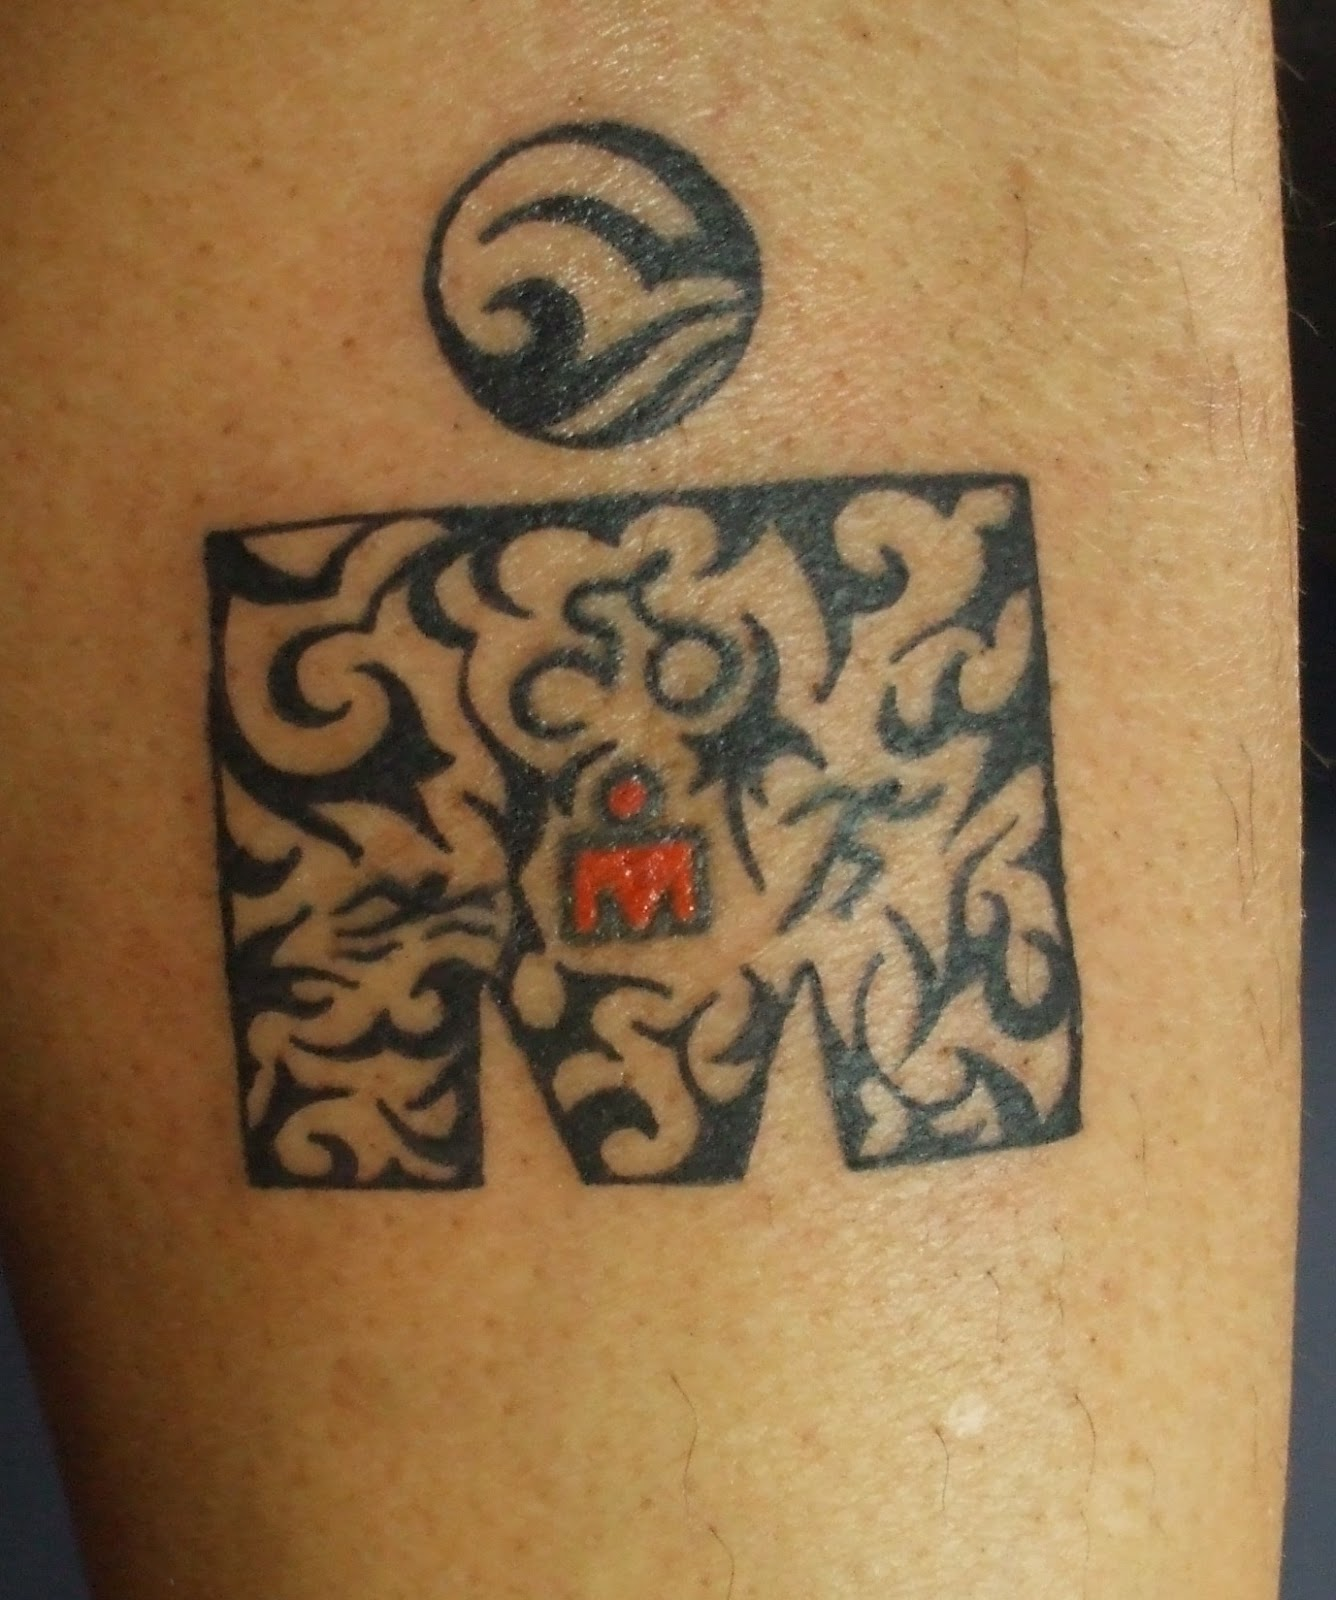 Lettres & Chiffres Tattoos TattooForAWeek